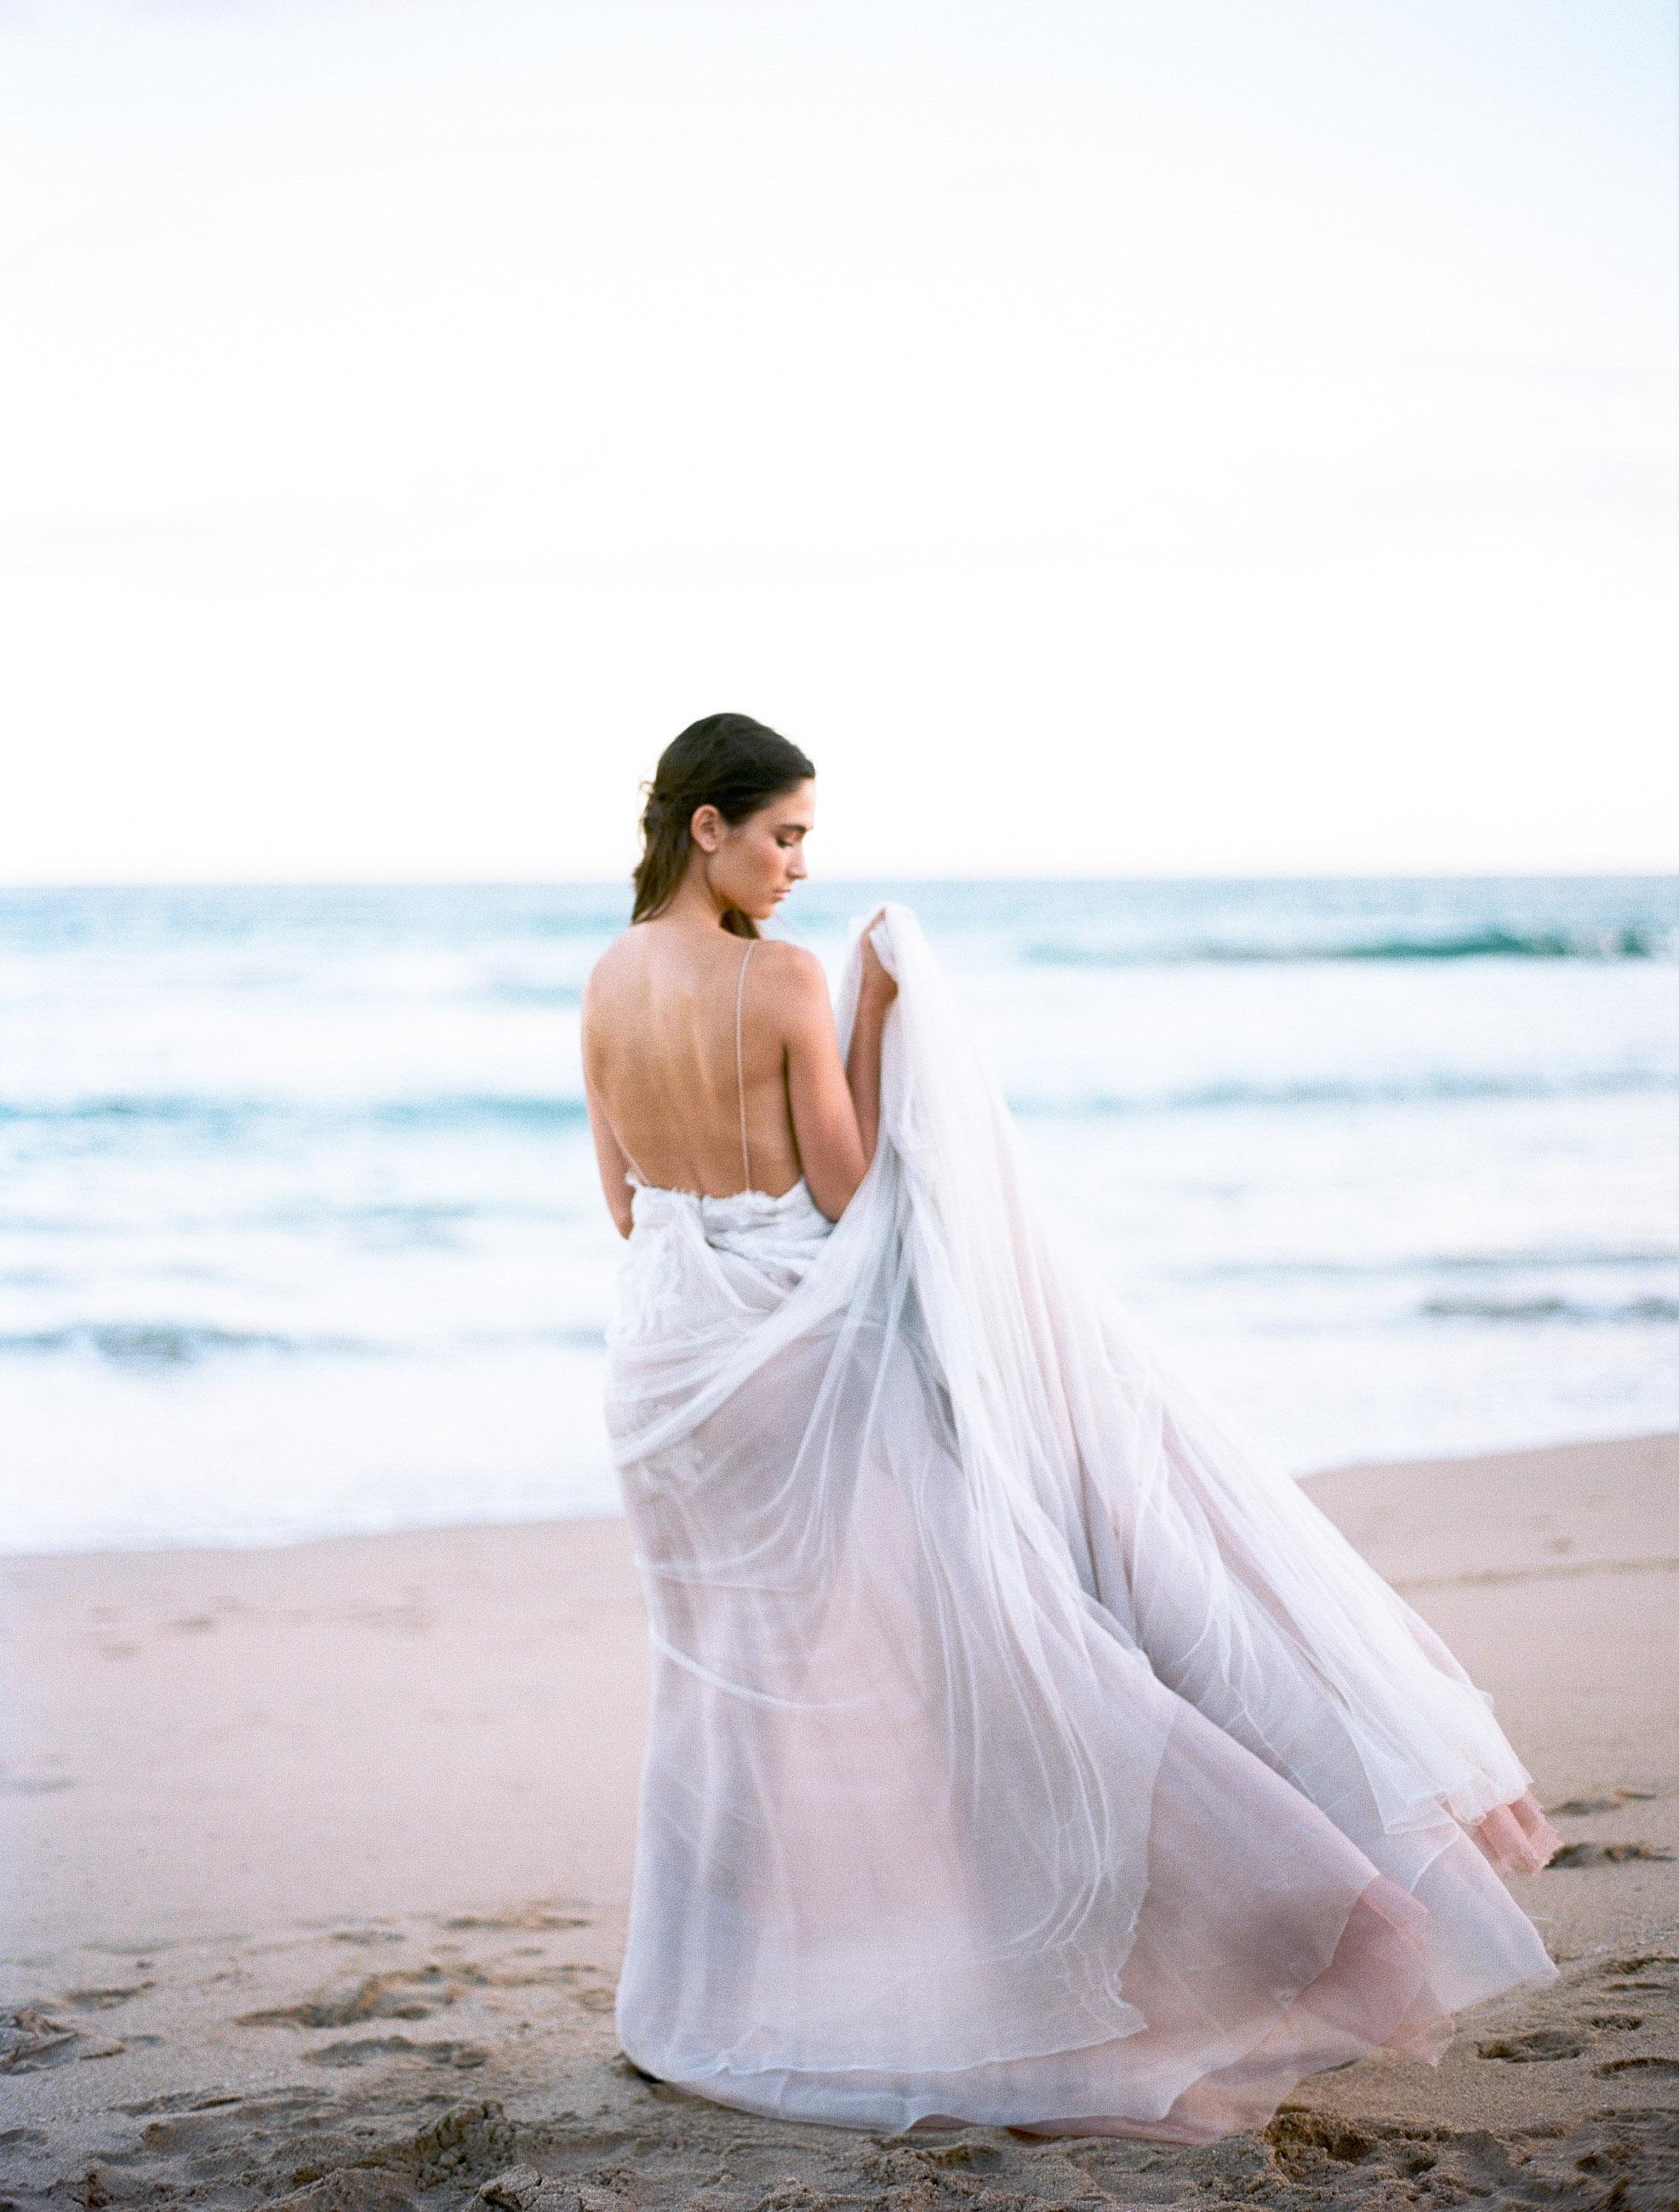 00004- Central Coast NSW Wedding Photographer.jpg